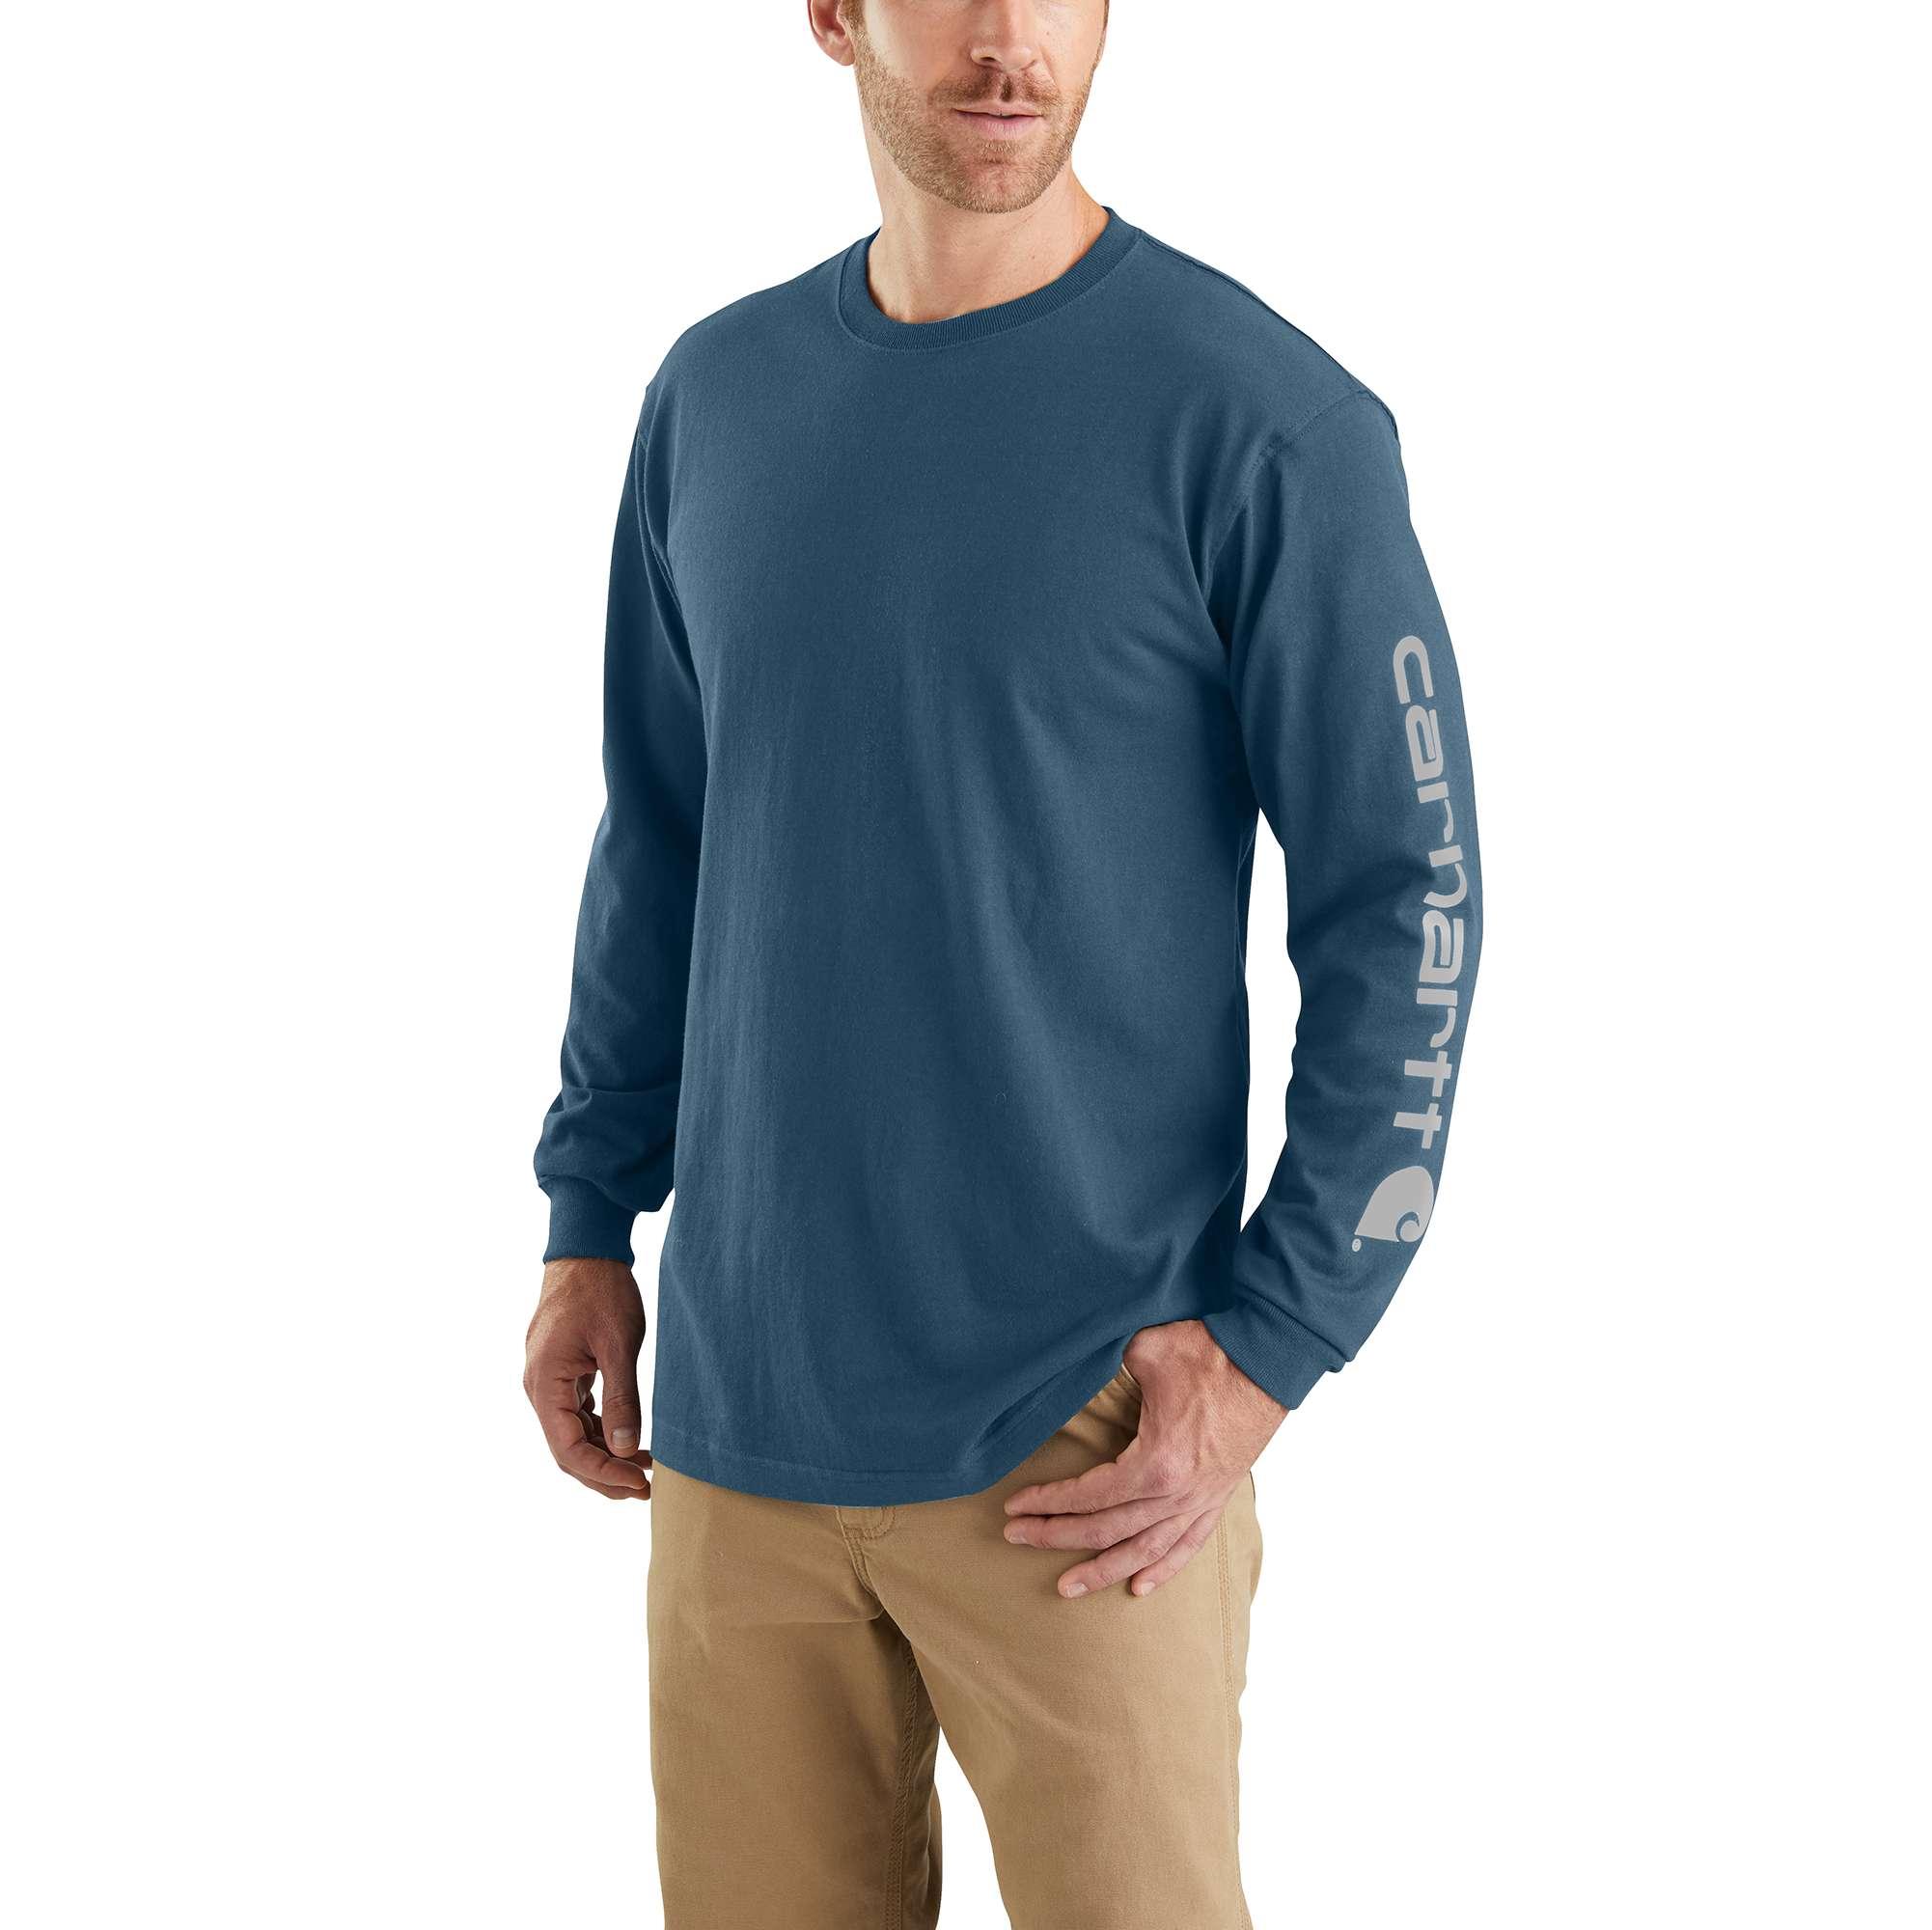 Men's  Long Sleeve Signature Logo Tall Tee, Blue, swatch